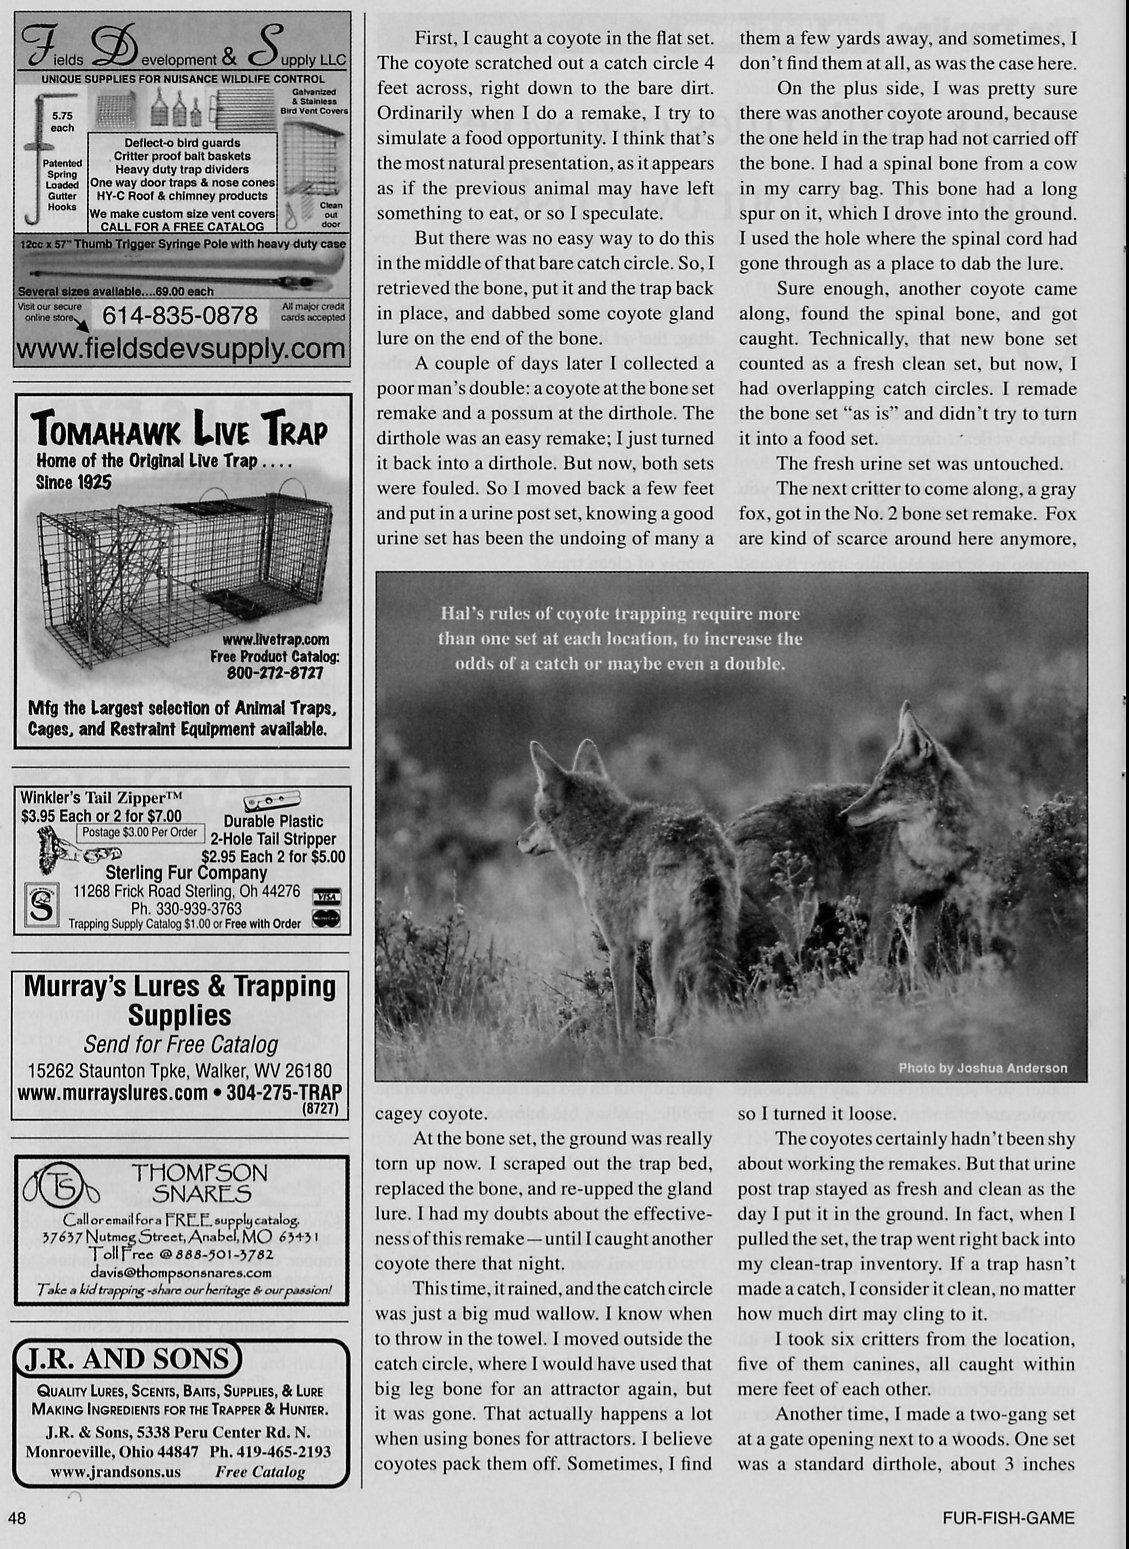 Fur-Fish-Game Magazine (inside); © December 2011